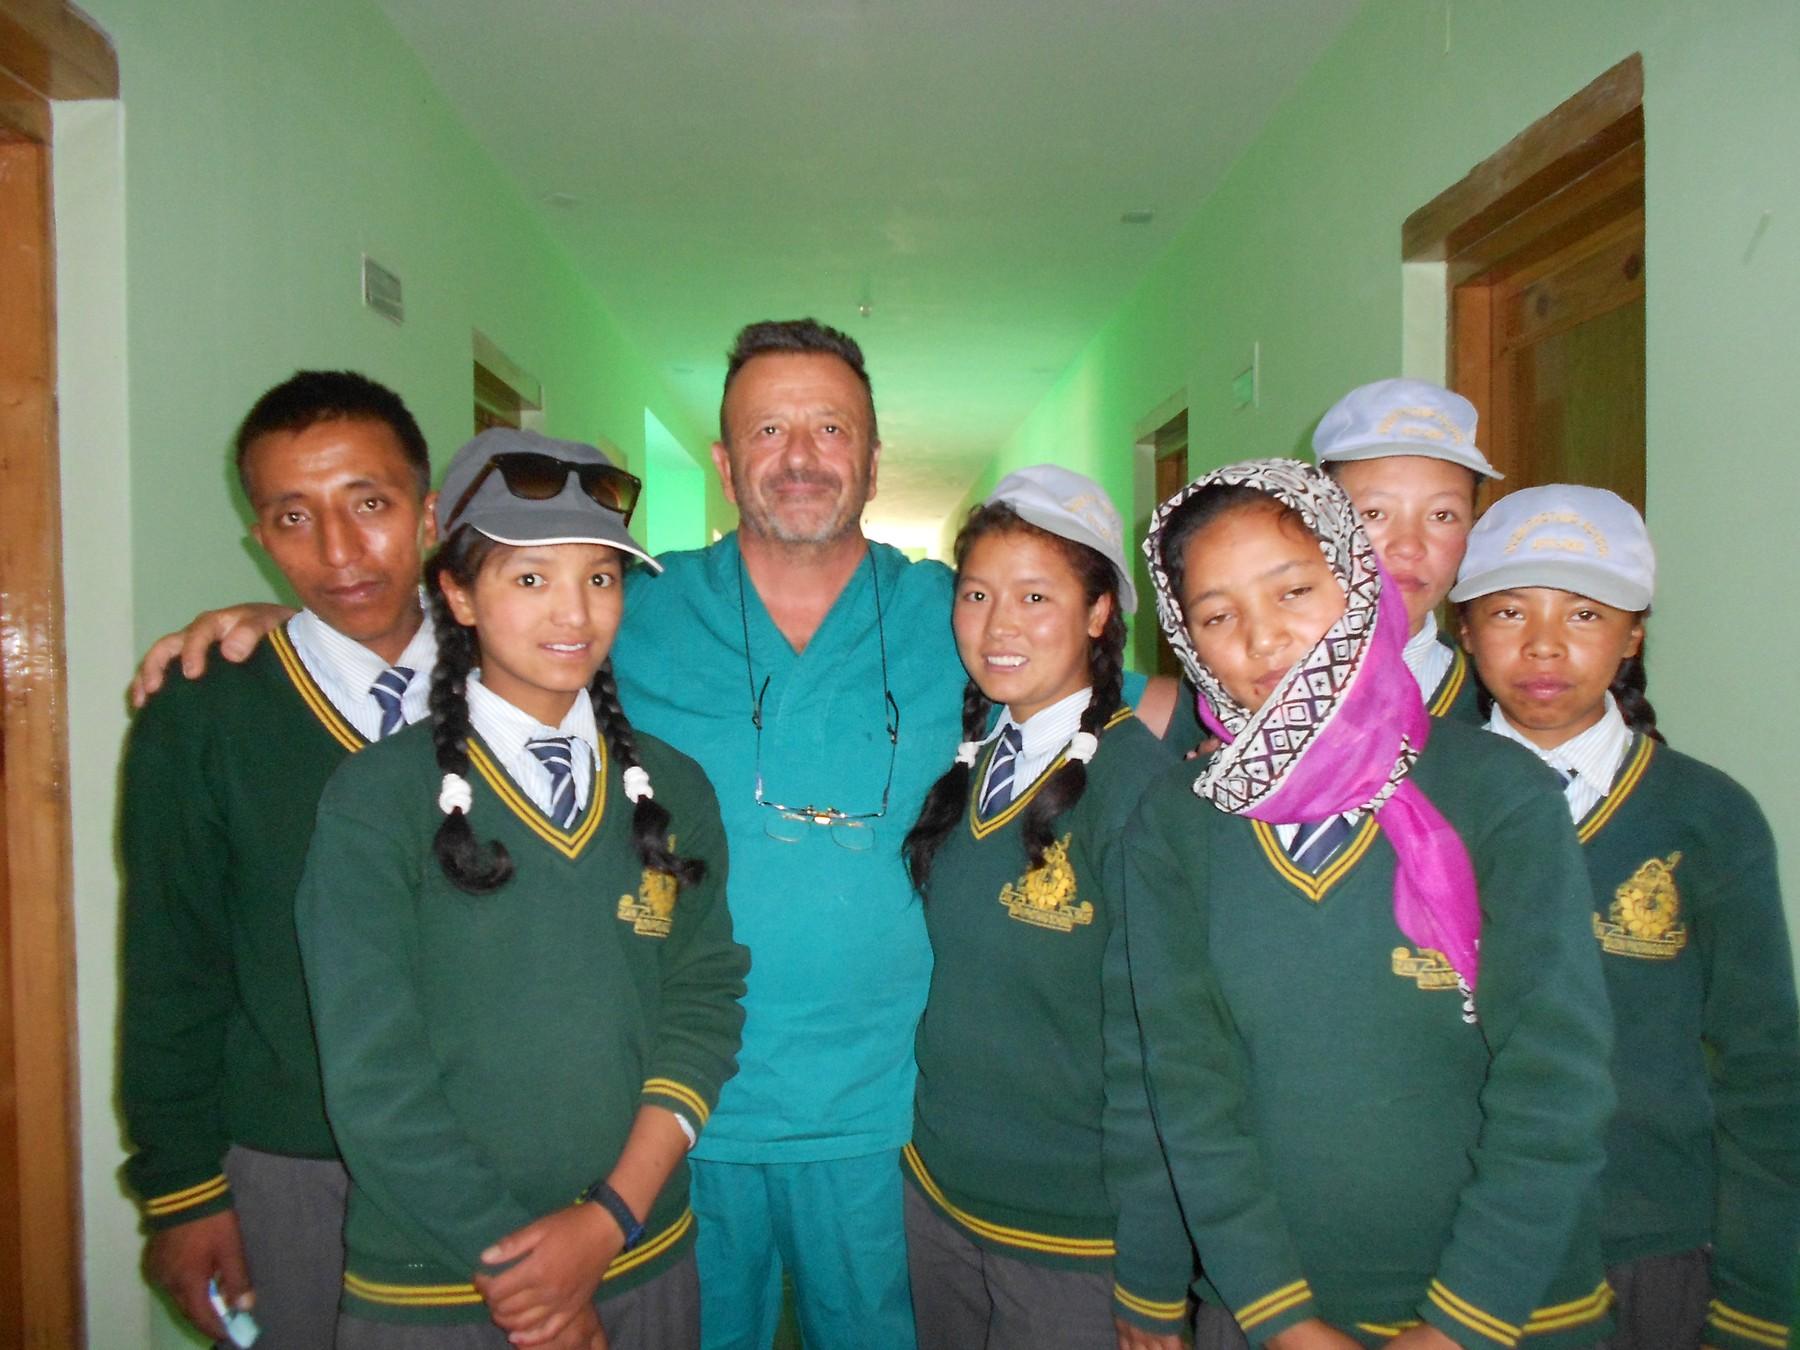 Dott. Stefano Brucoli insieme ad alcuni ragazzi